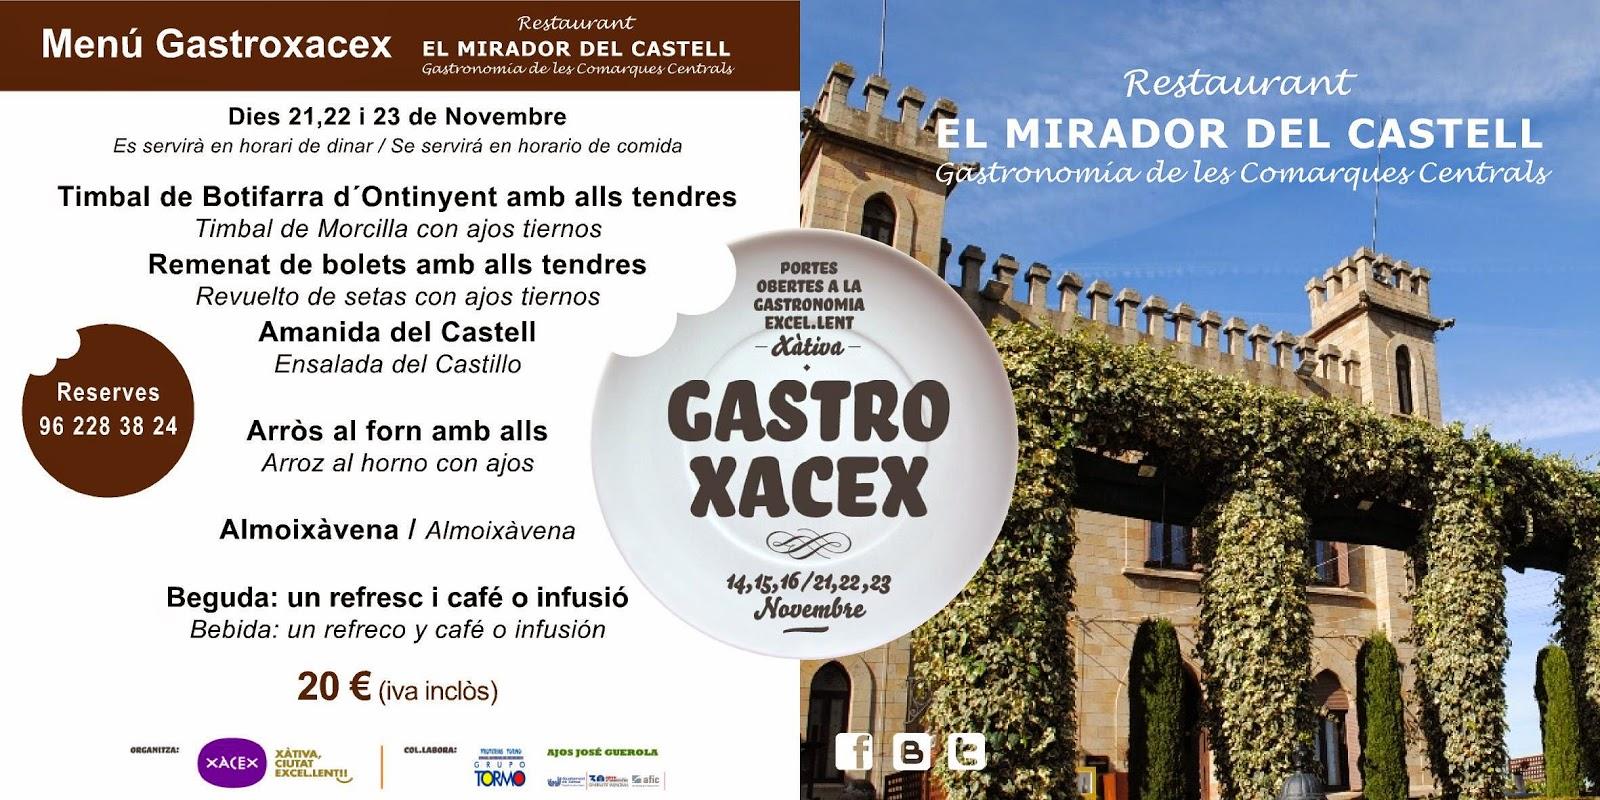 MENÚ GASTROXACEX XATIVA